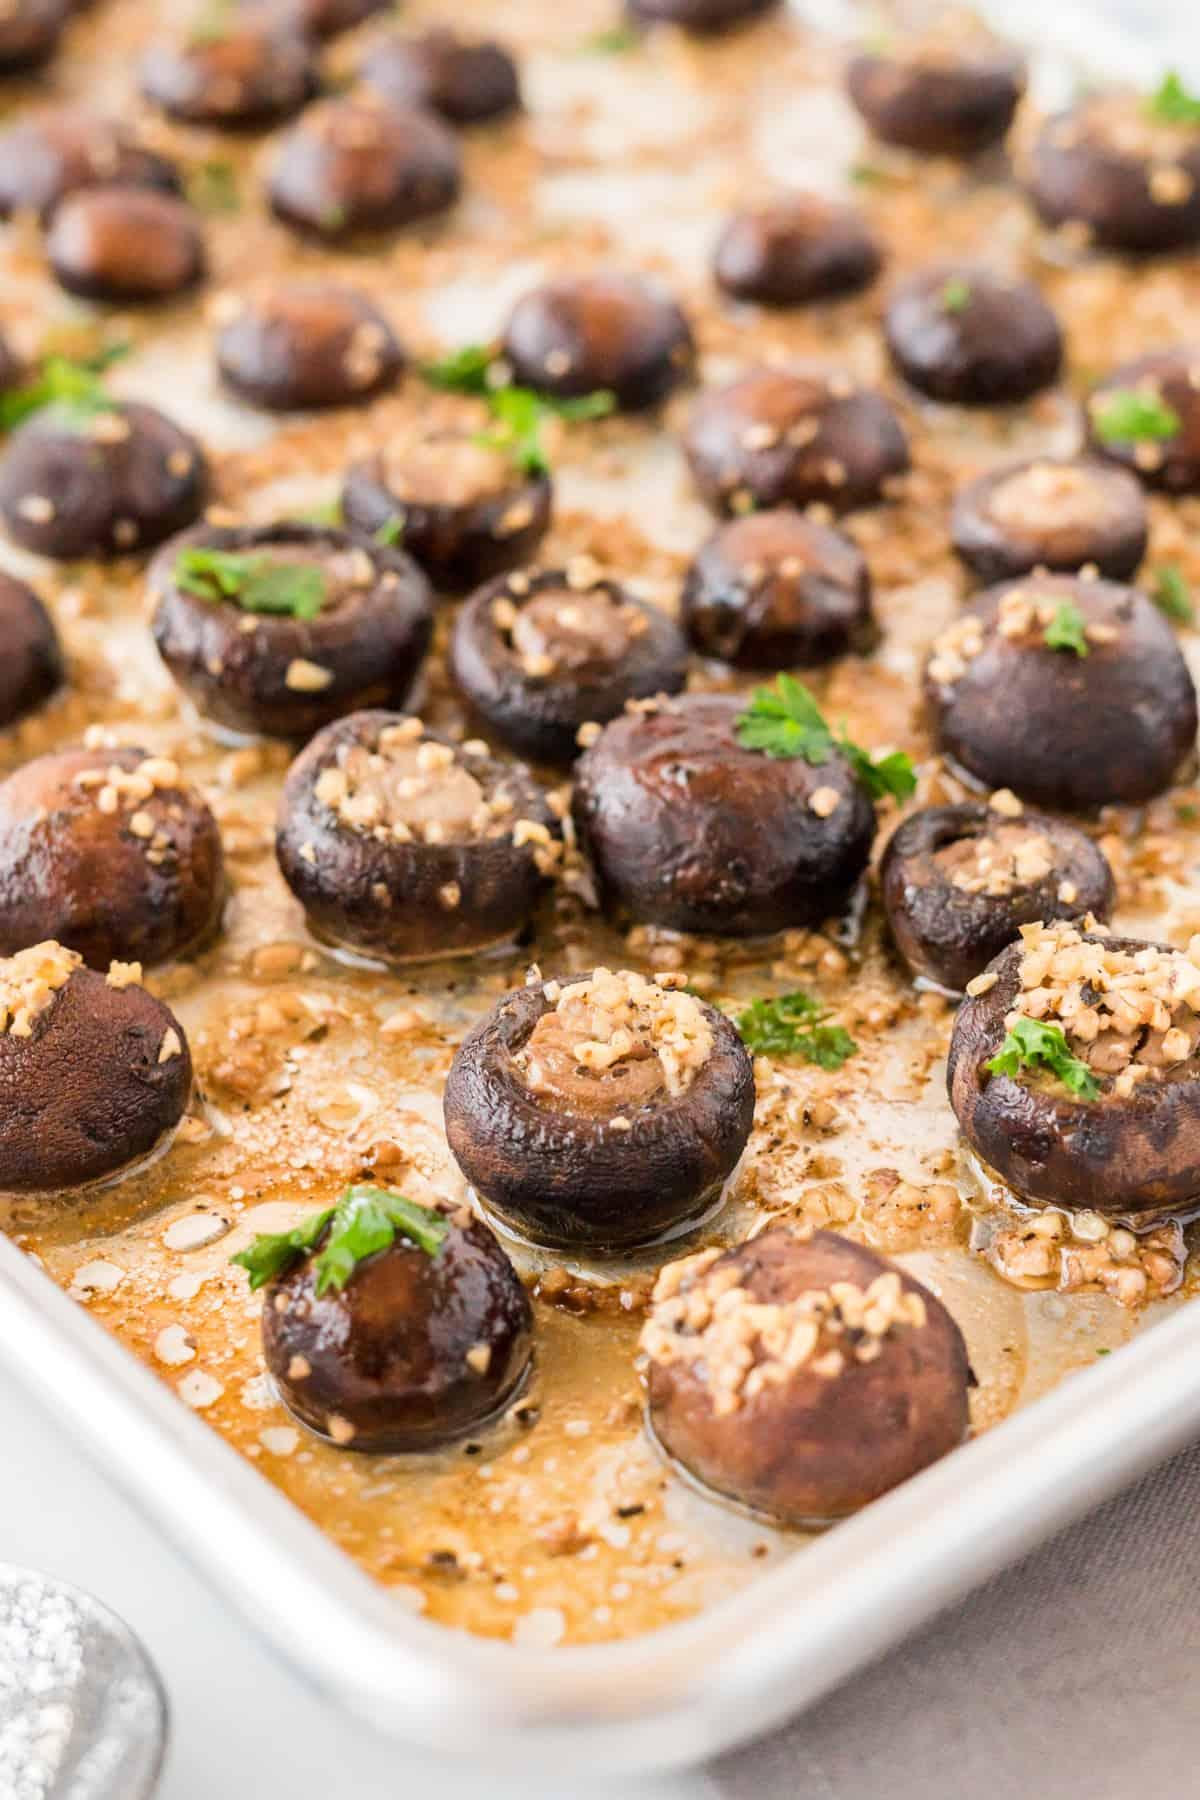 mushrooms roasted in garlic butter on a baking sheet